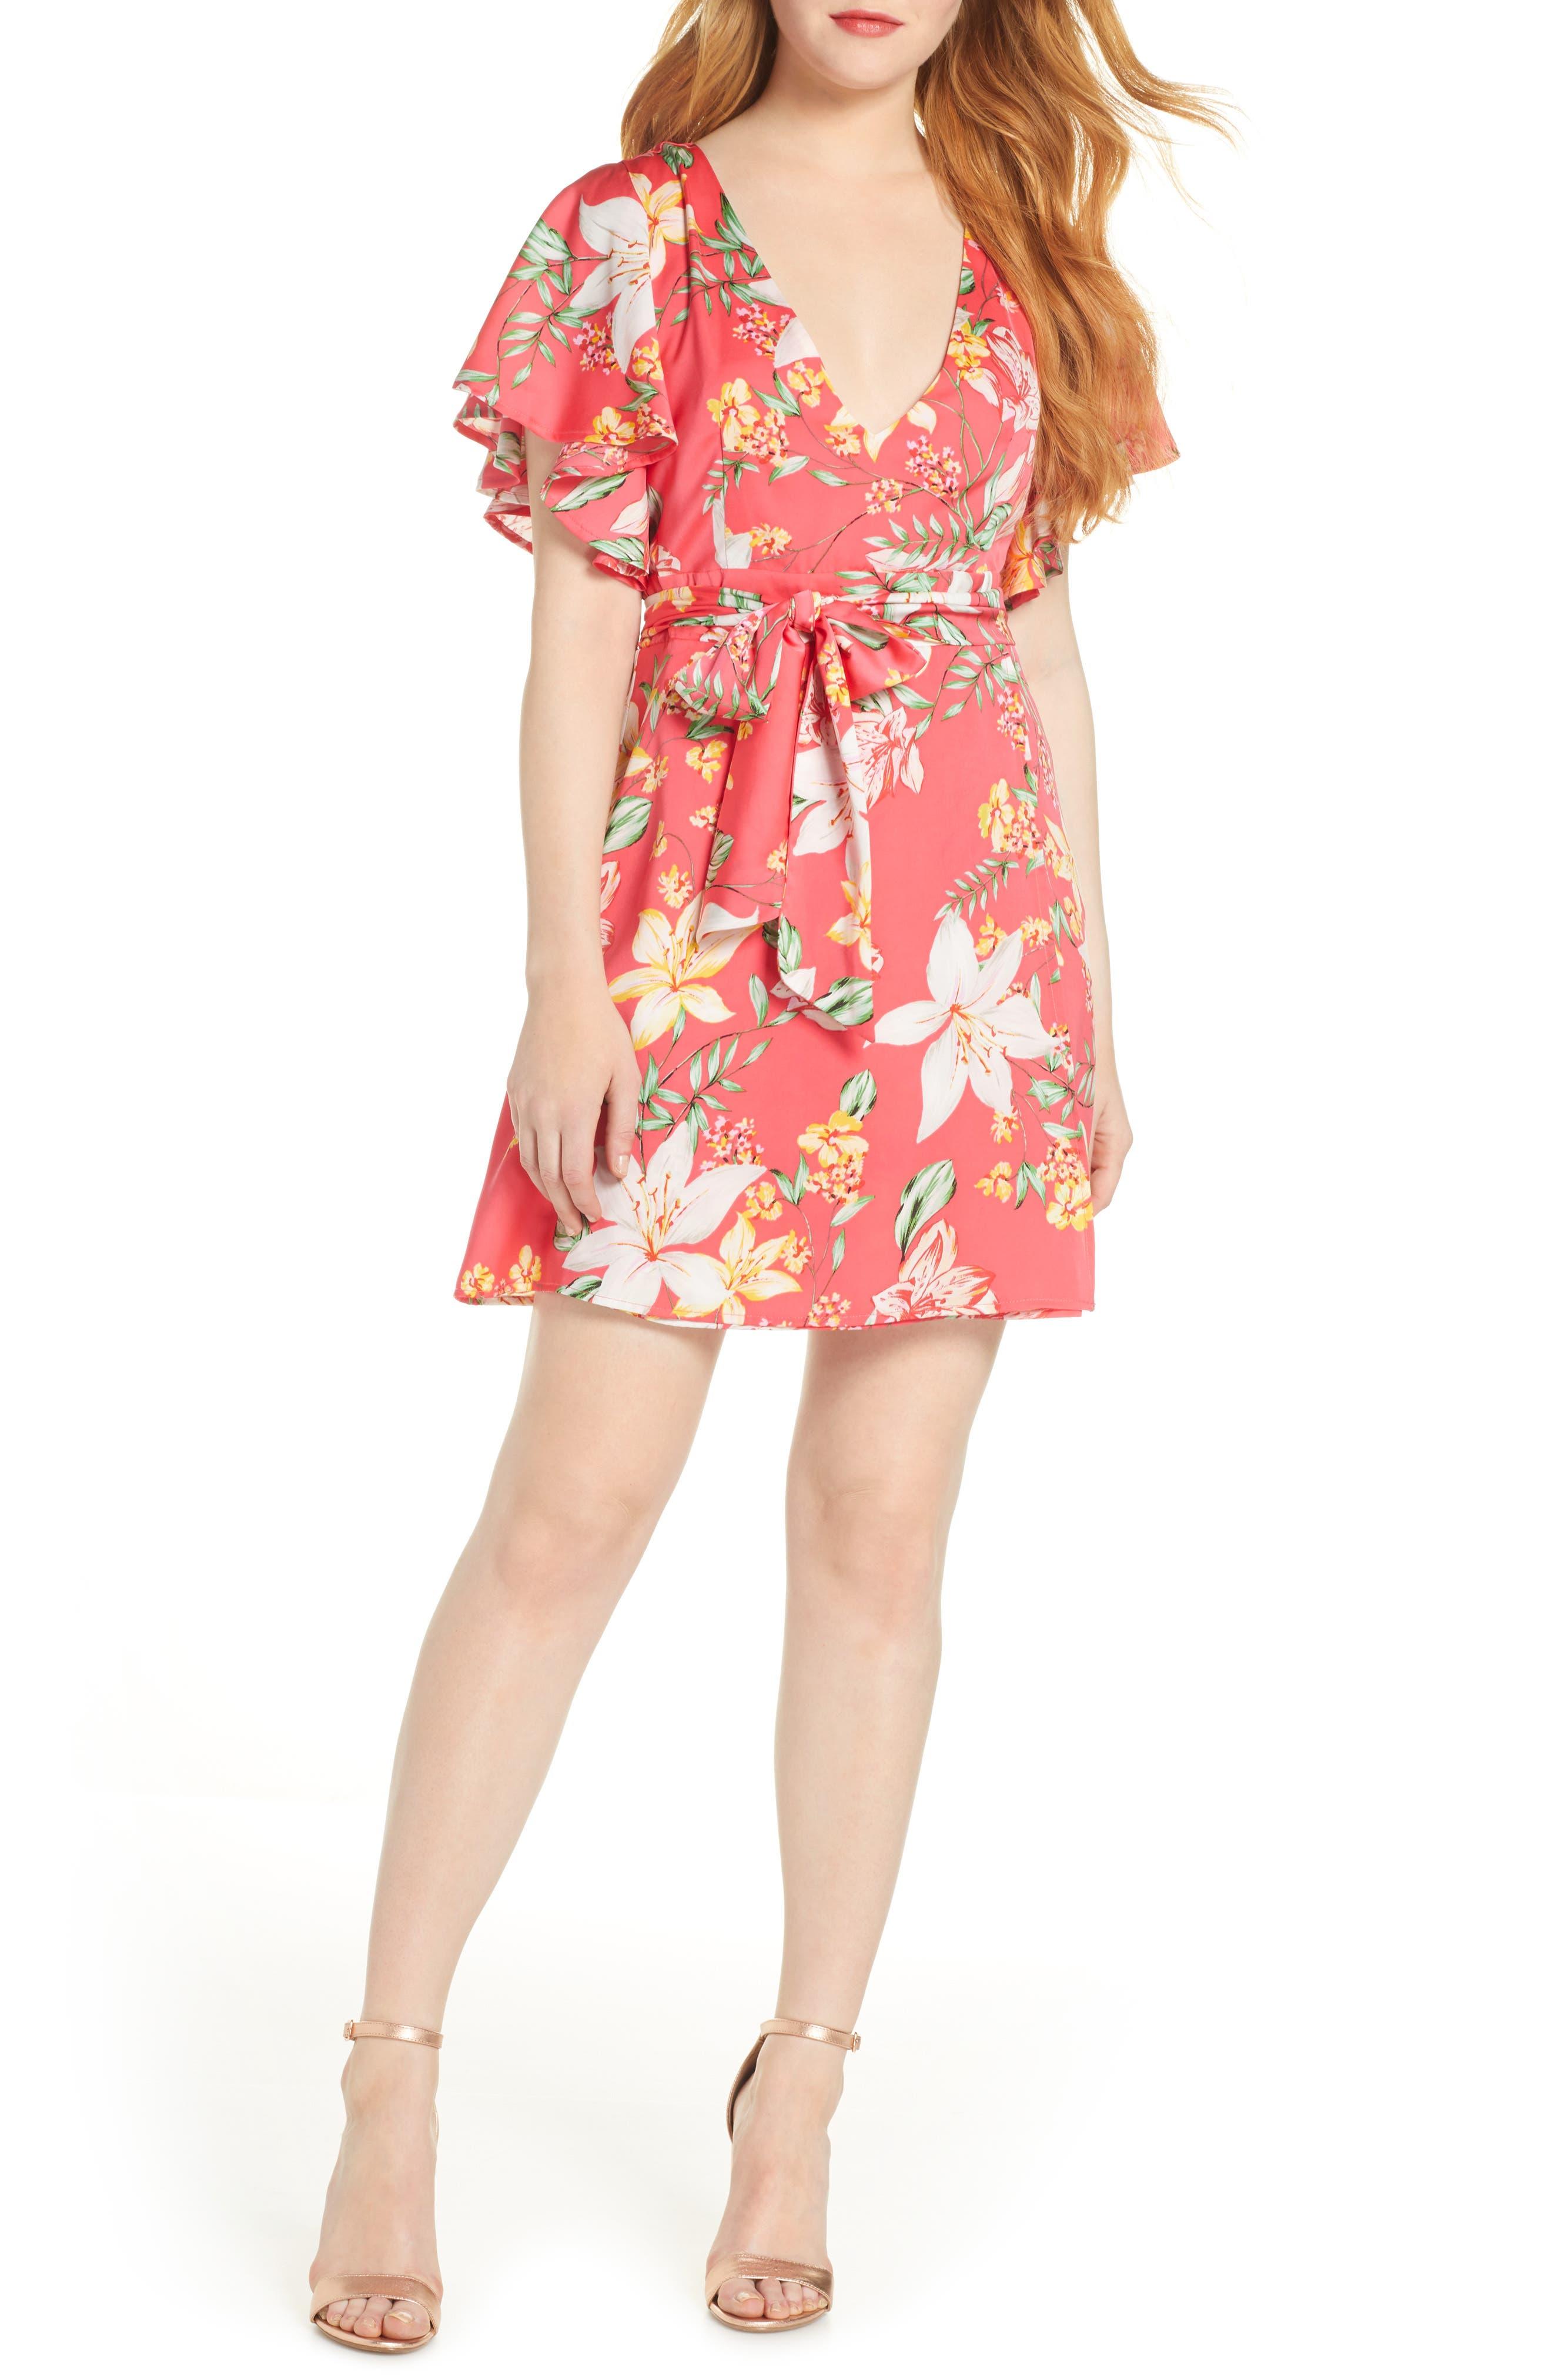 Bb Dakota Tropic Tropical Vine Print Dress, Pink